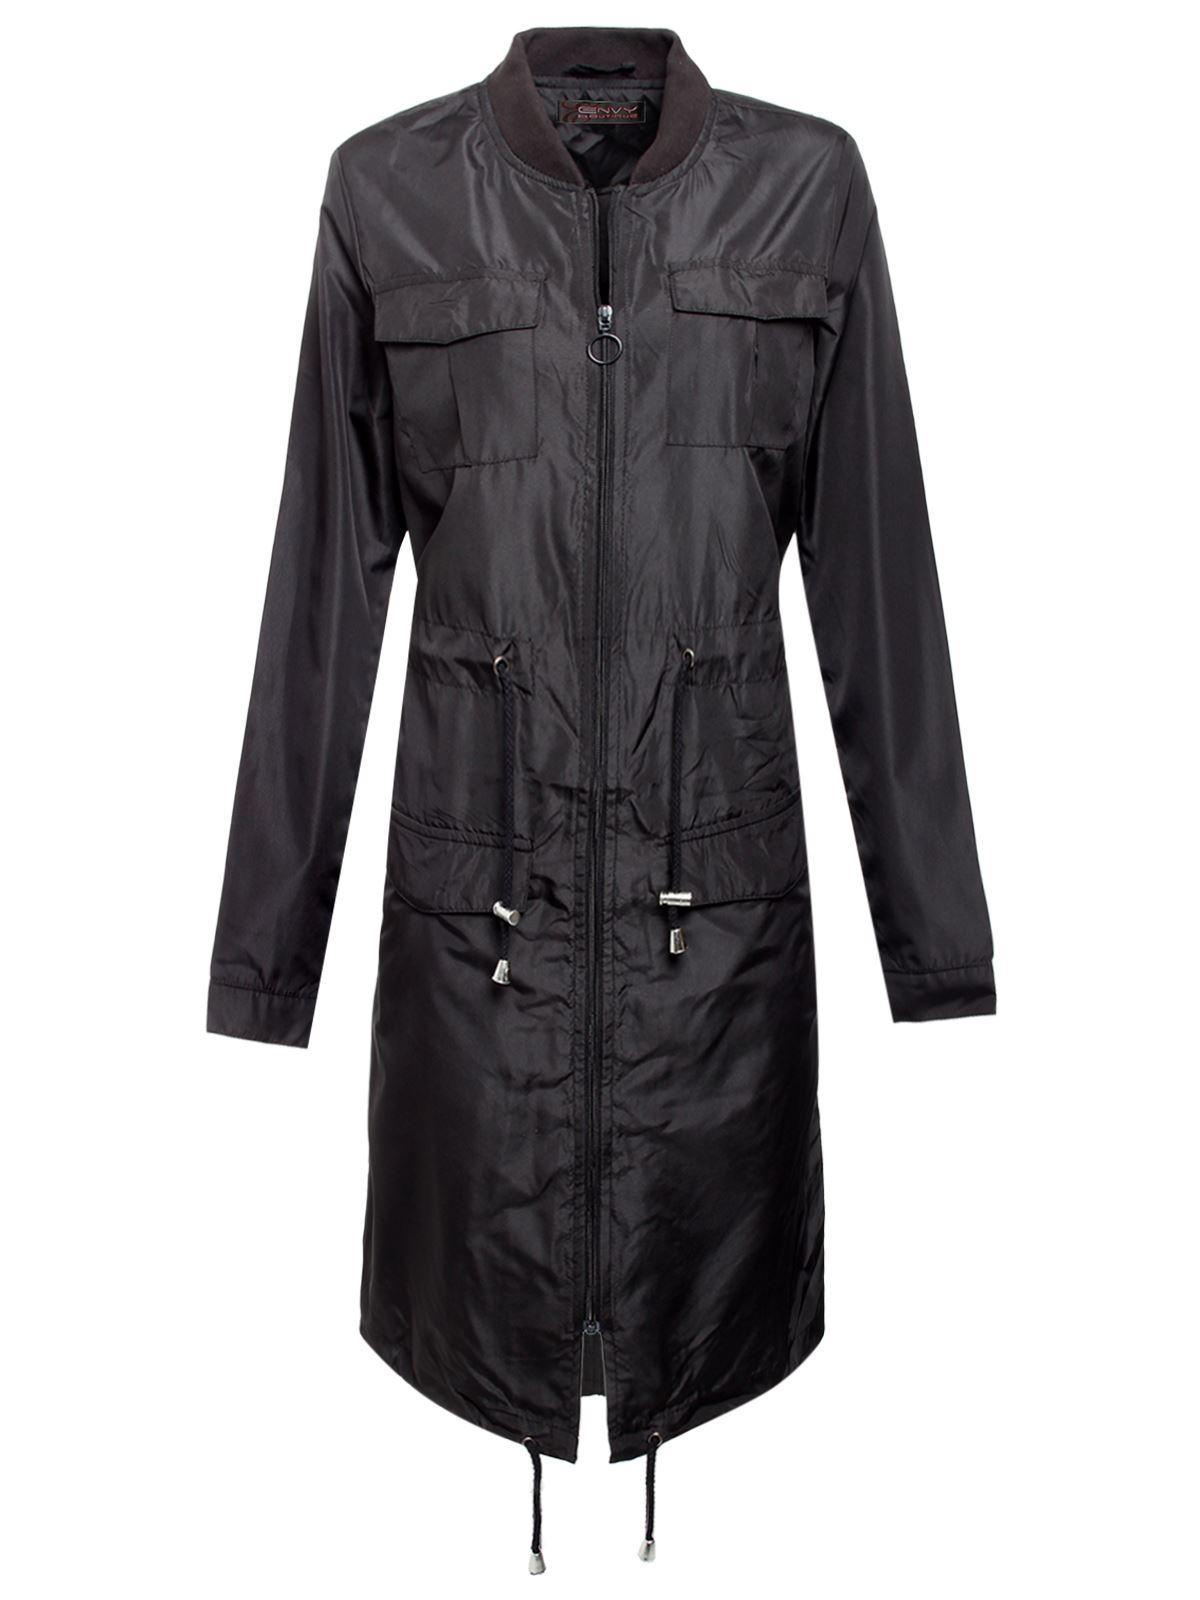 Womens Hooded Rain Jacket